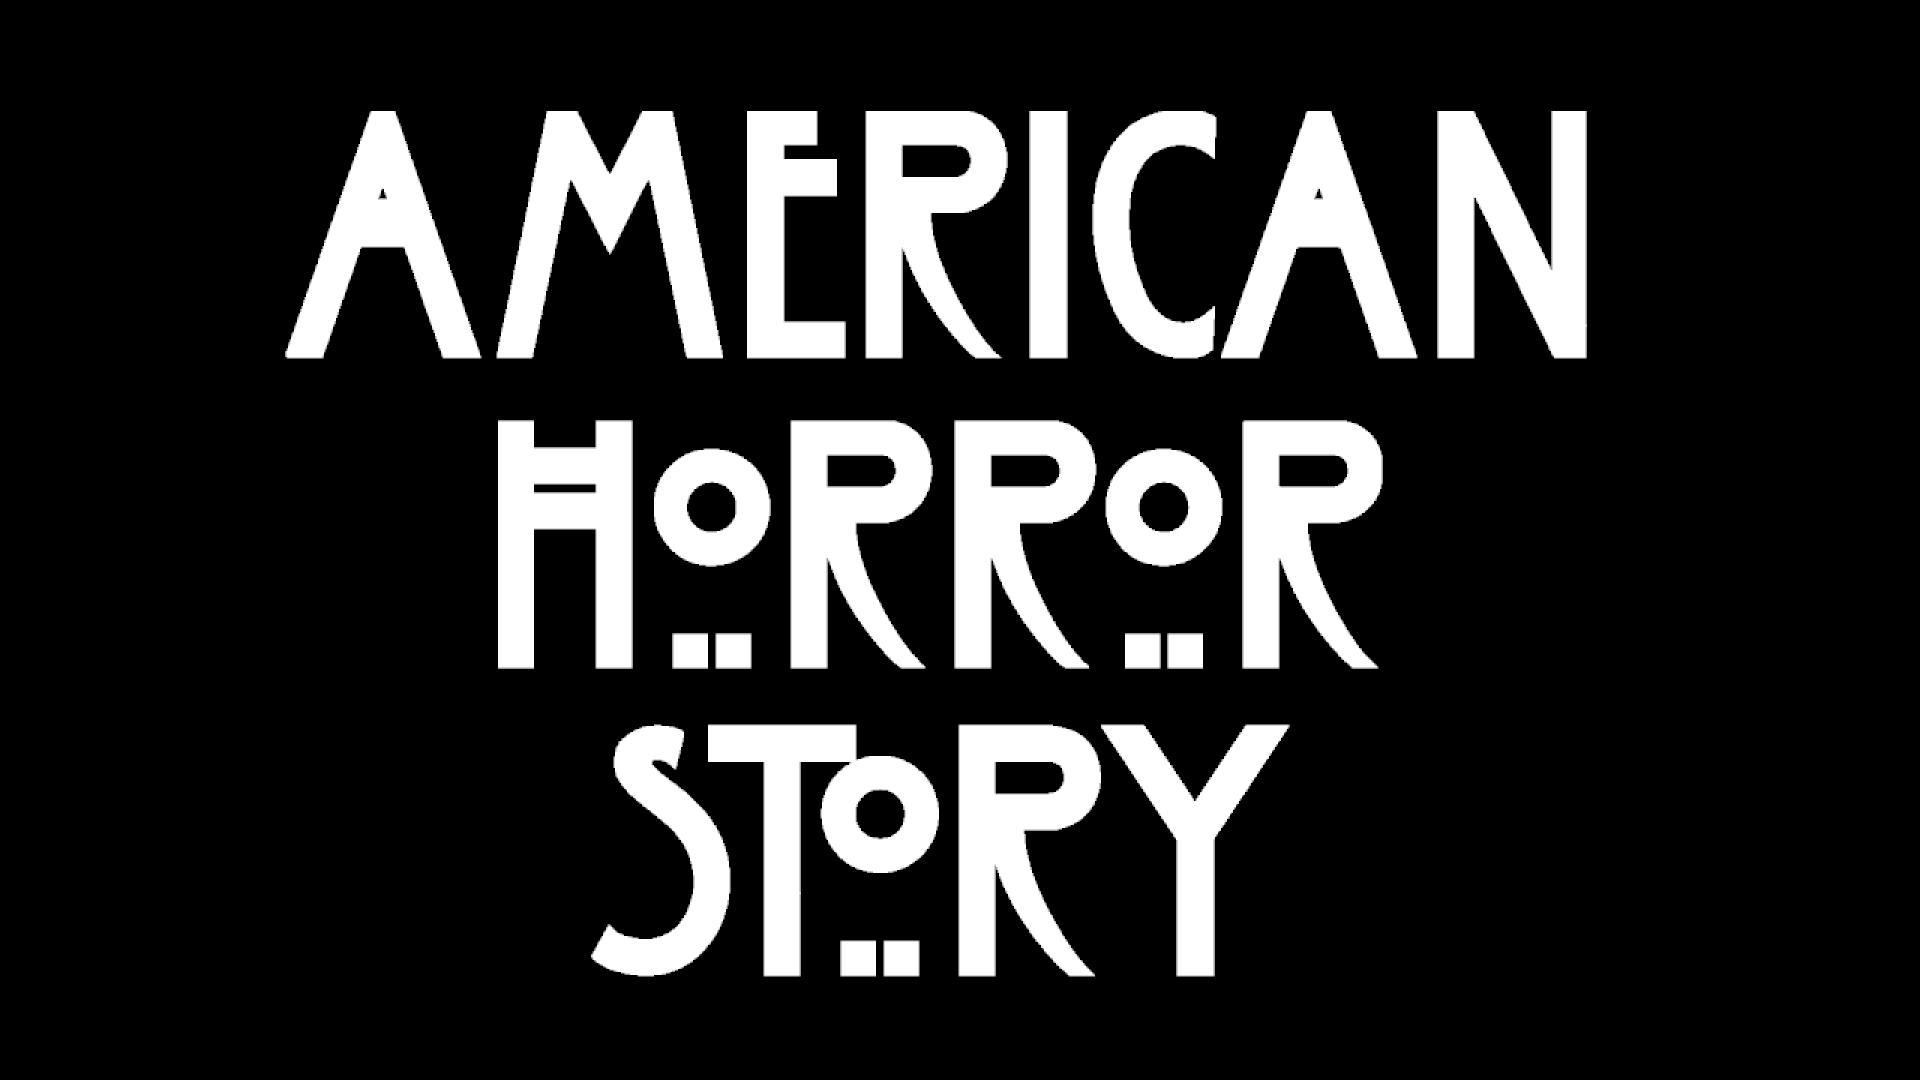 American Horror Story: Horrorland ??